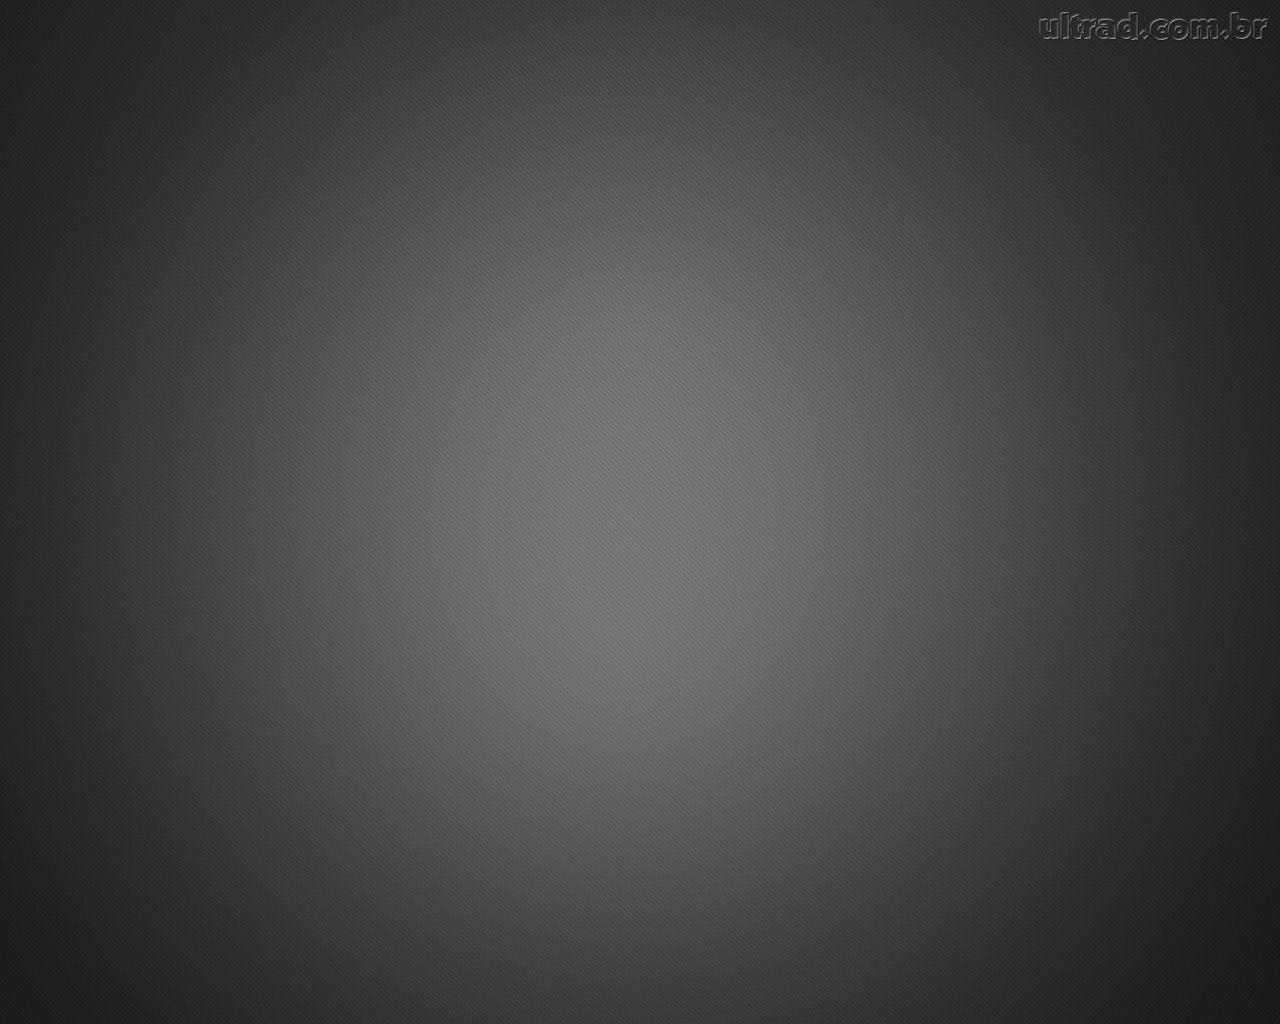 Download image Papel De Parede Fundo Preto PC Android iPhone and  #656565 1280x1024 Banheiro Azul Escuro E Branco